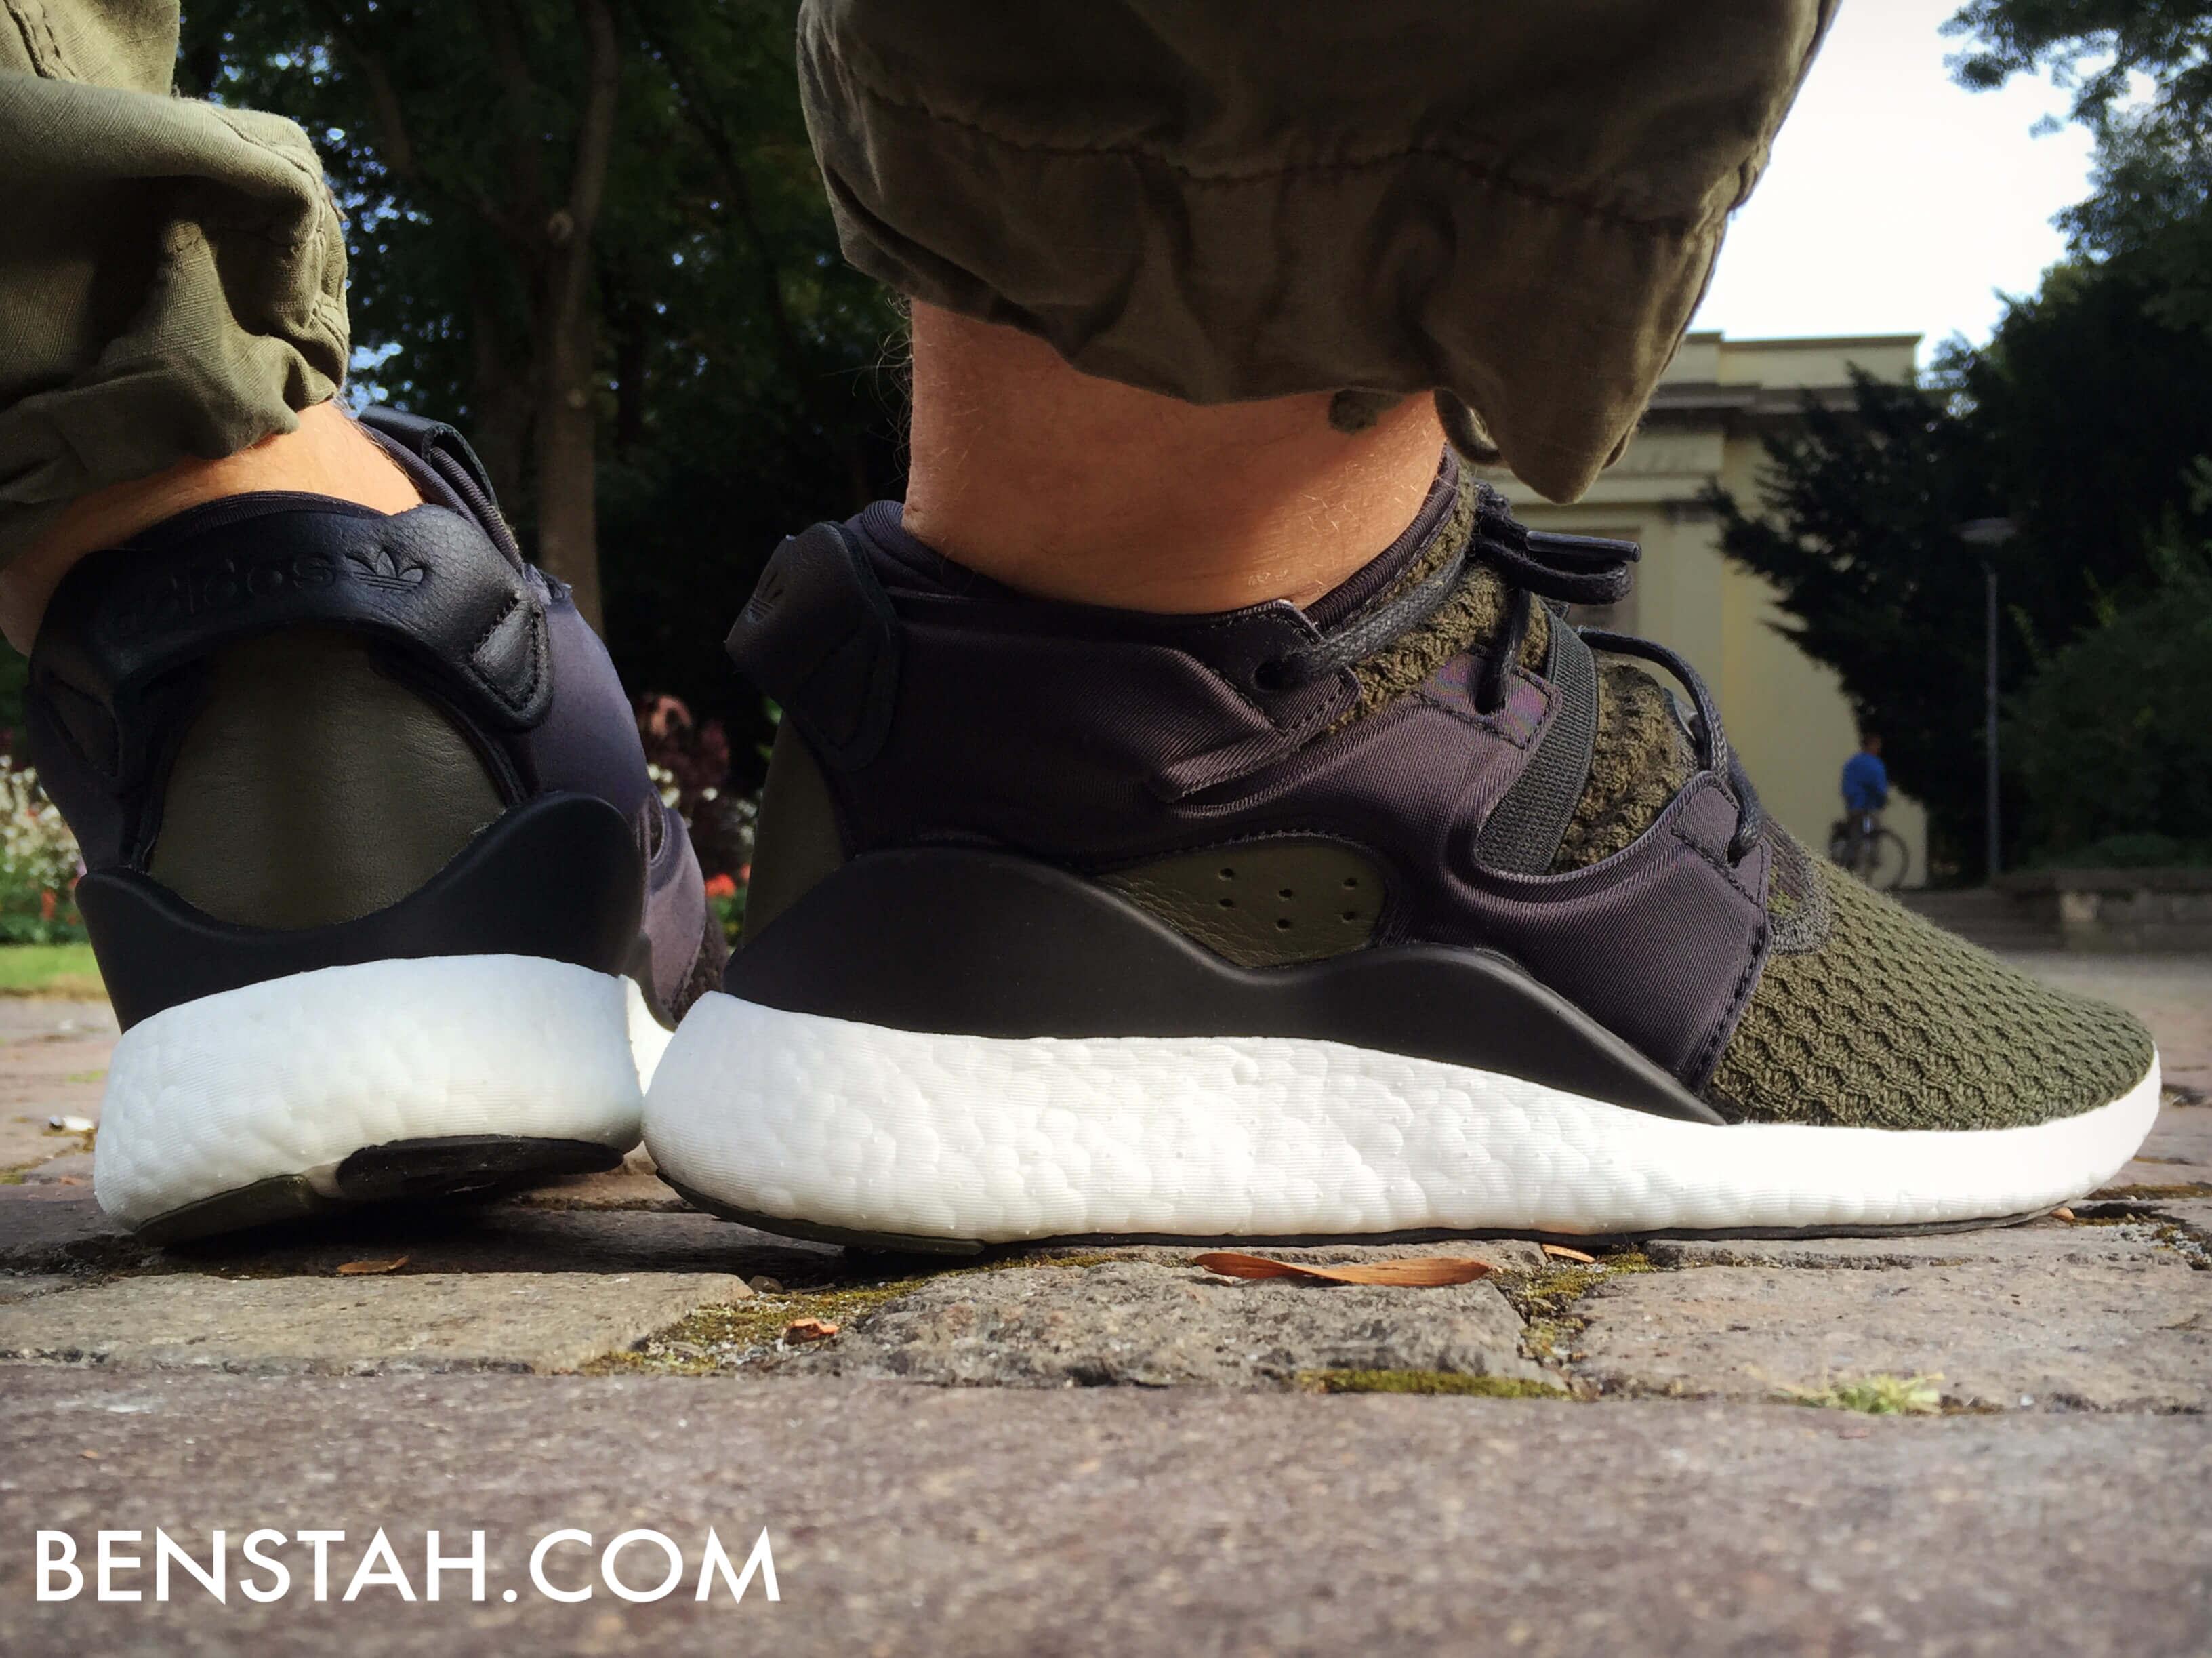 adidas-eqt-2-3-f15-athleisure-rear-view-benstah-onfeet